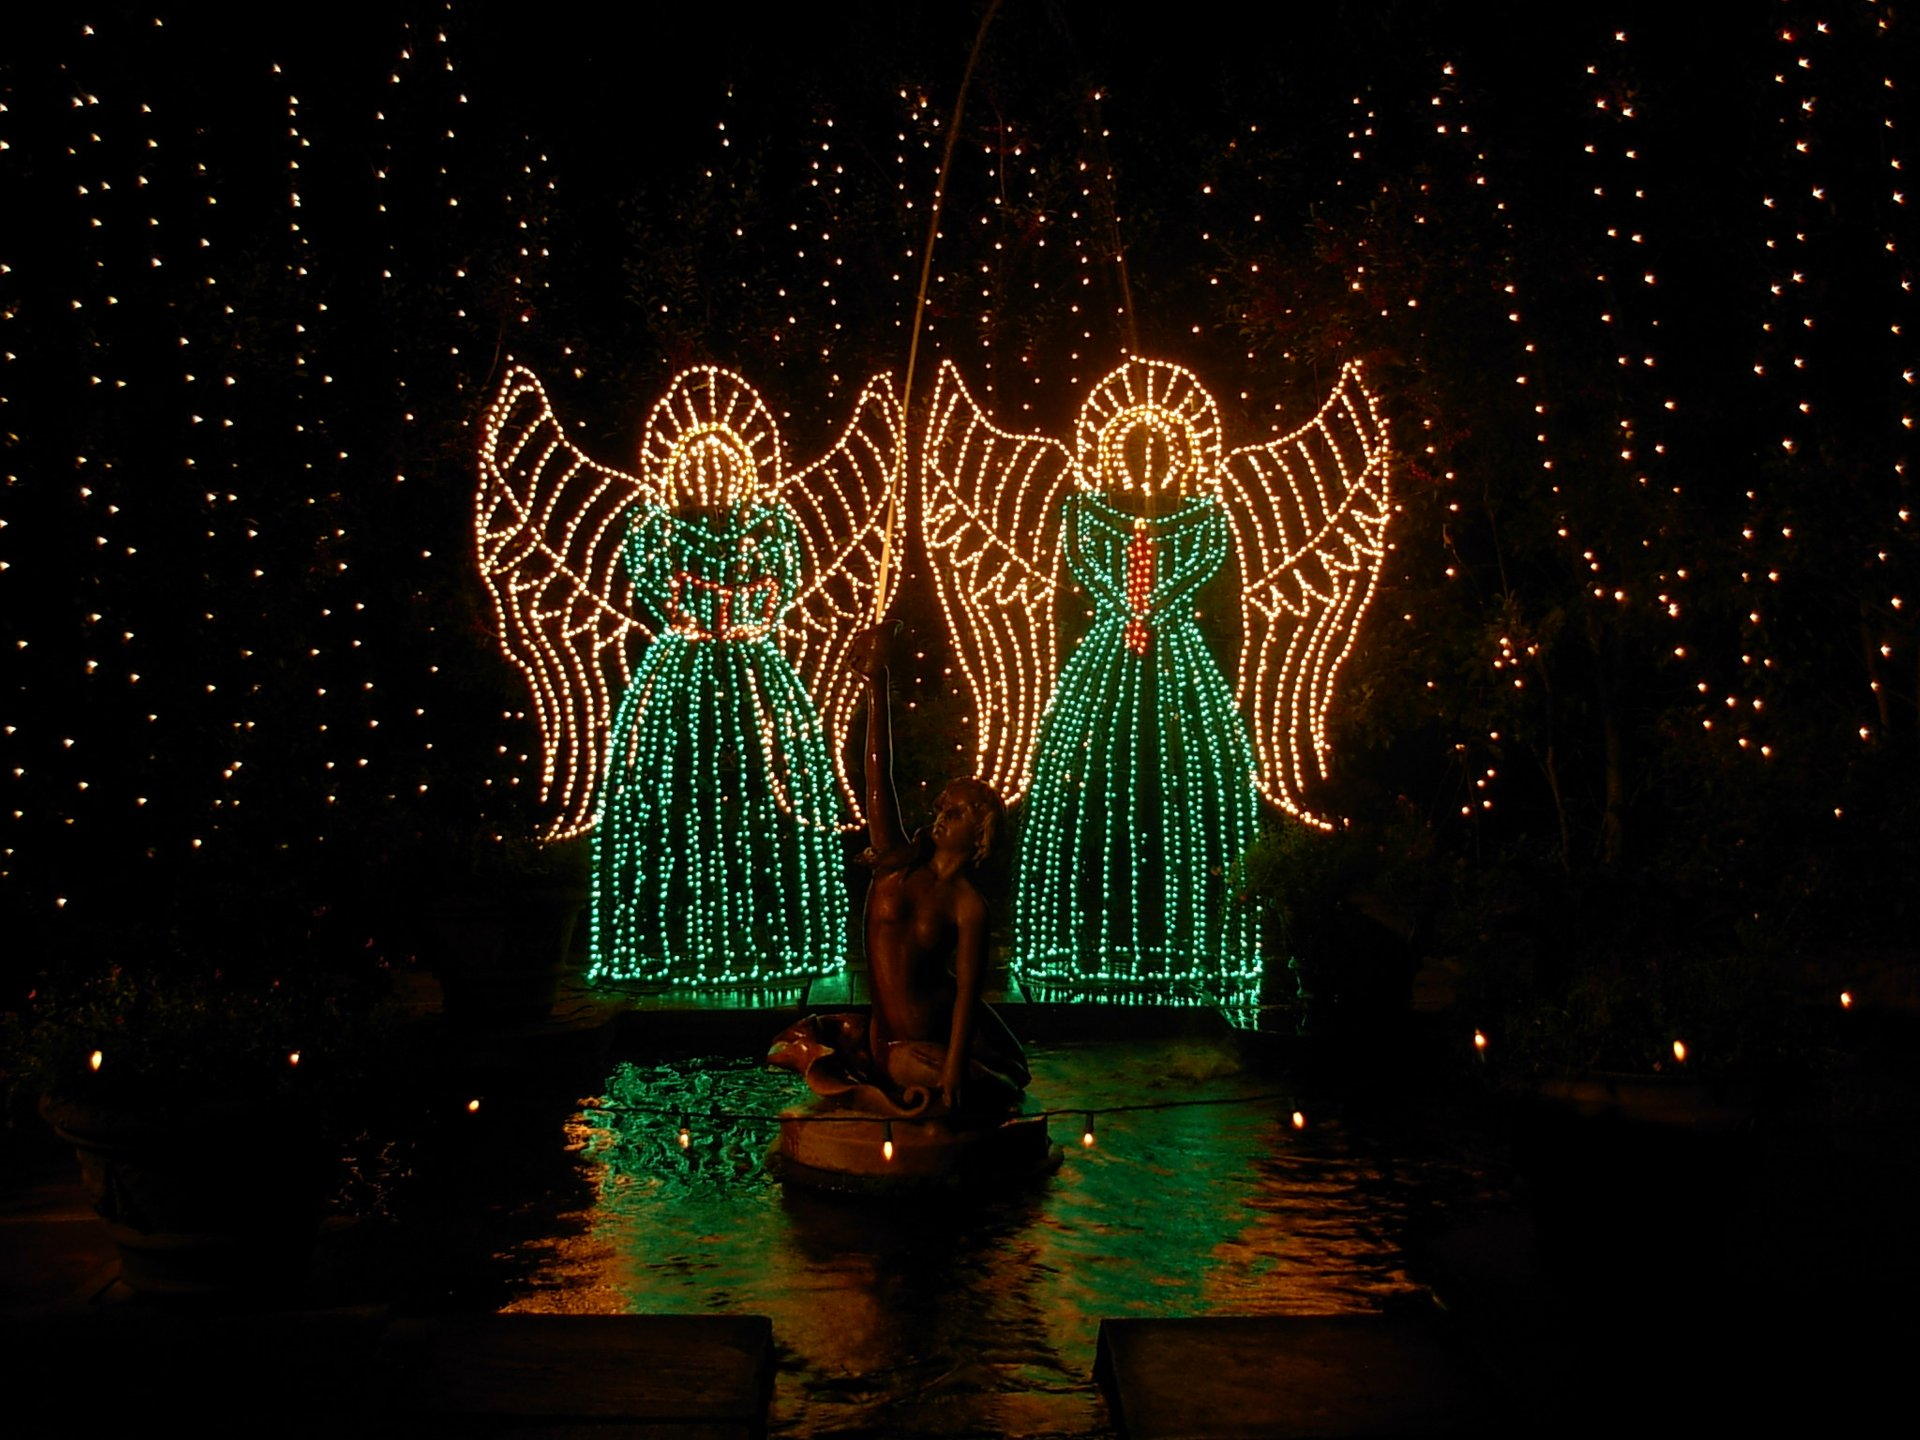 Christmas Lights In Alabama 2020 Christmas Lights 2020 2021 in Alabama   Dates